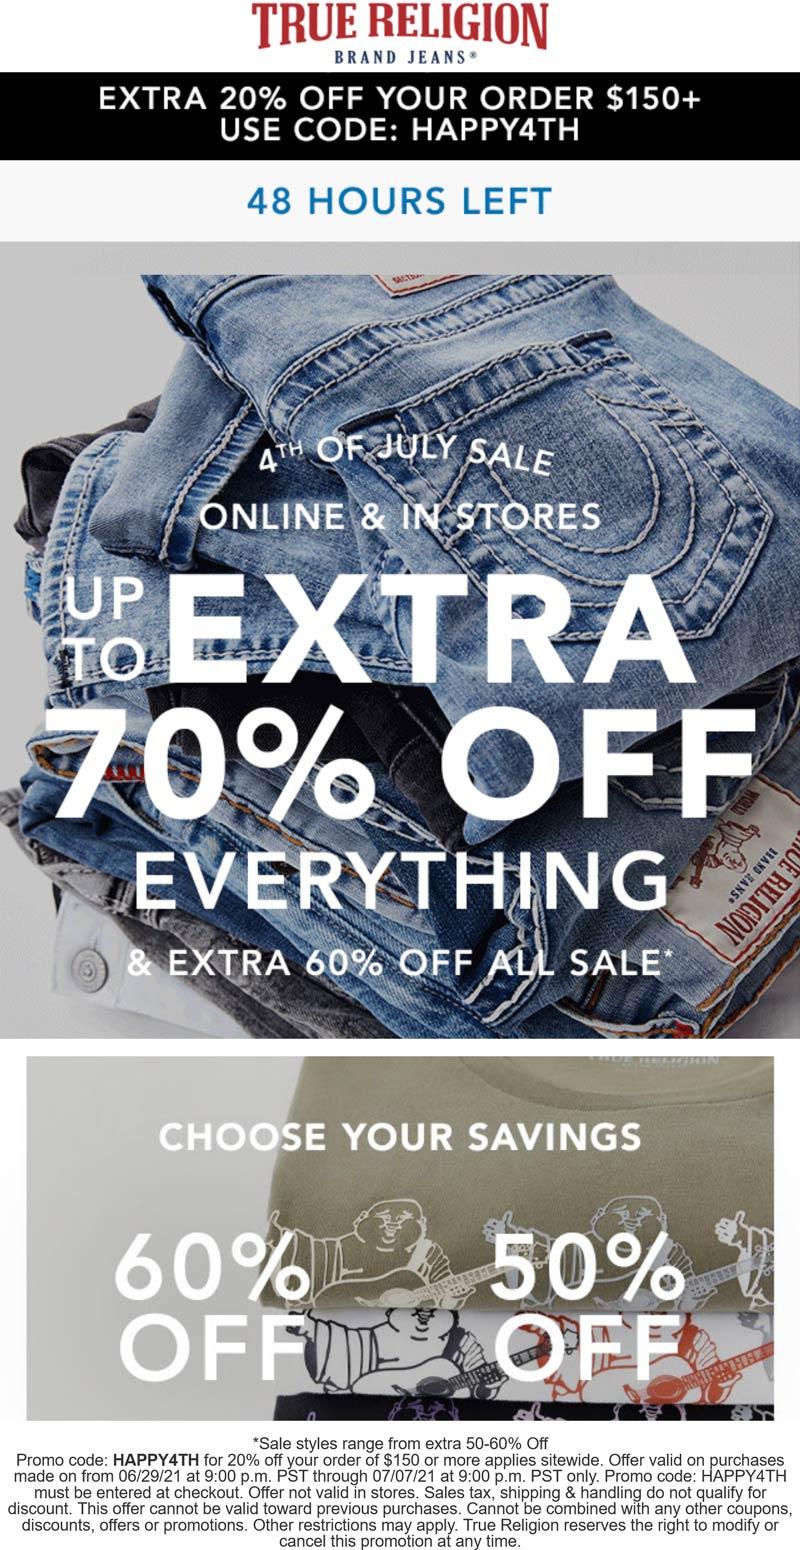 True Religion stores Coupon  Extra 60% off sale items at True Religion, or 20% off $150 online via promo code HAPPY4th #truereligion